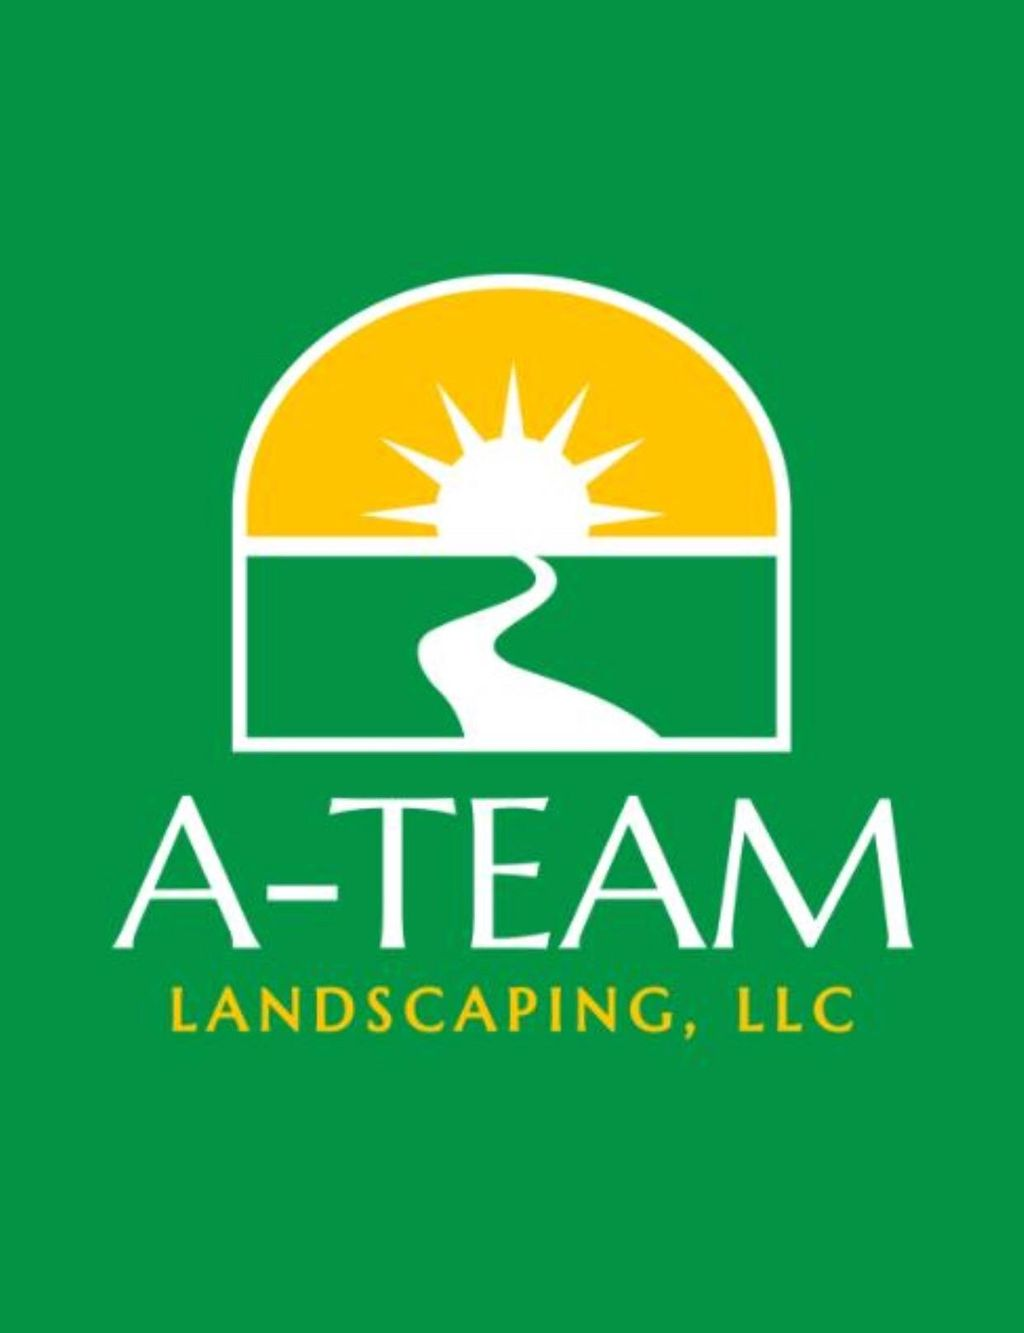 A-TeamLandScapingLLC